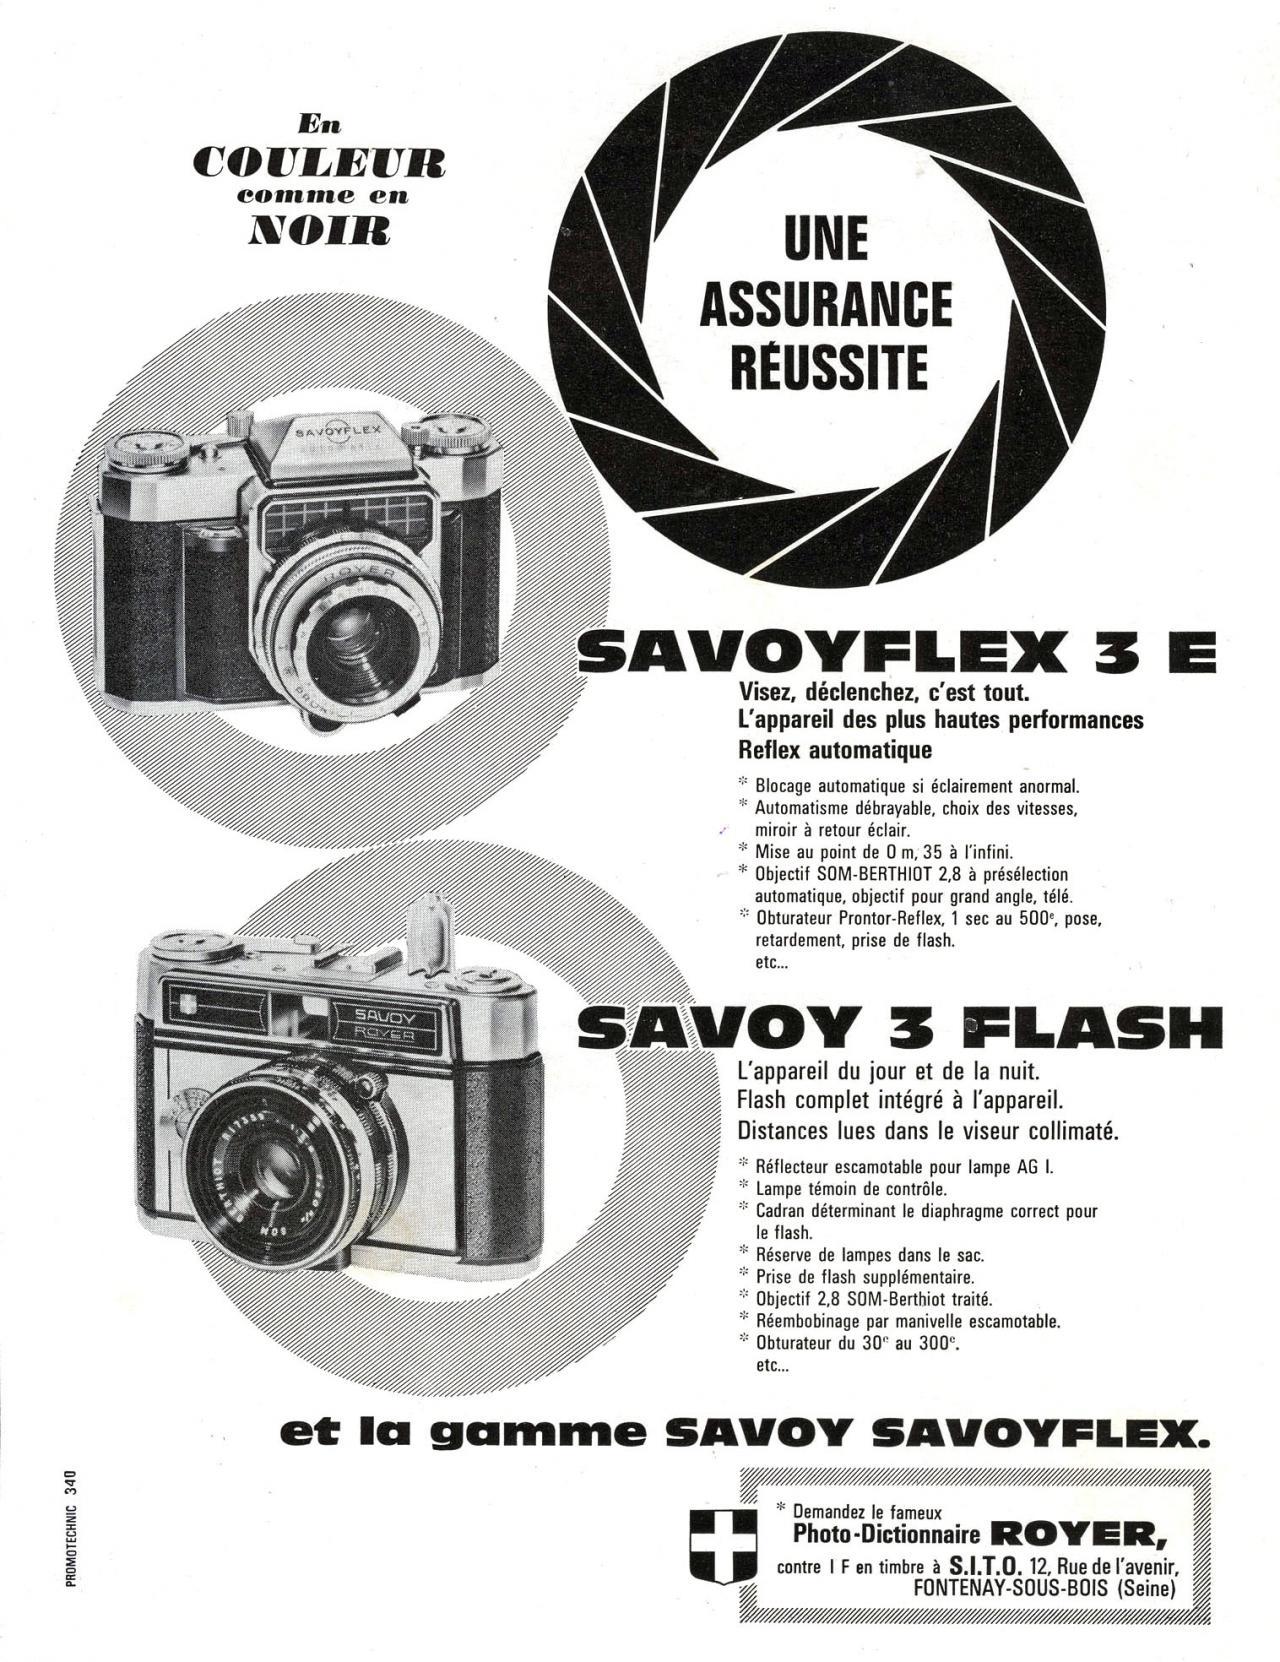 Wallpaper 1449-4  SITO de ROYER  Savoyflex type II, collection AMI Appareils photos